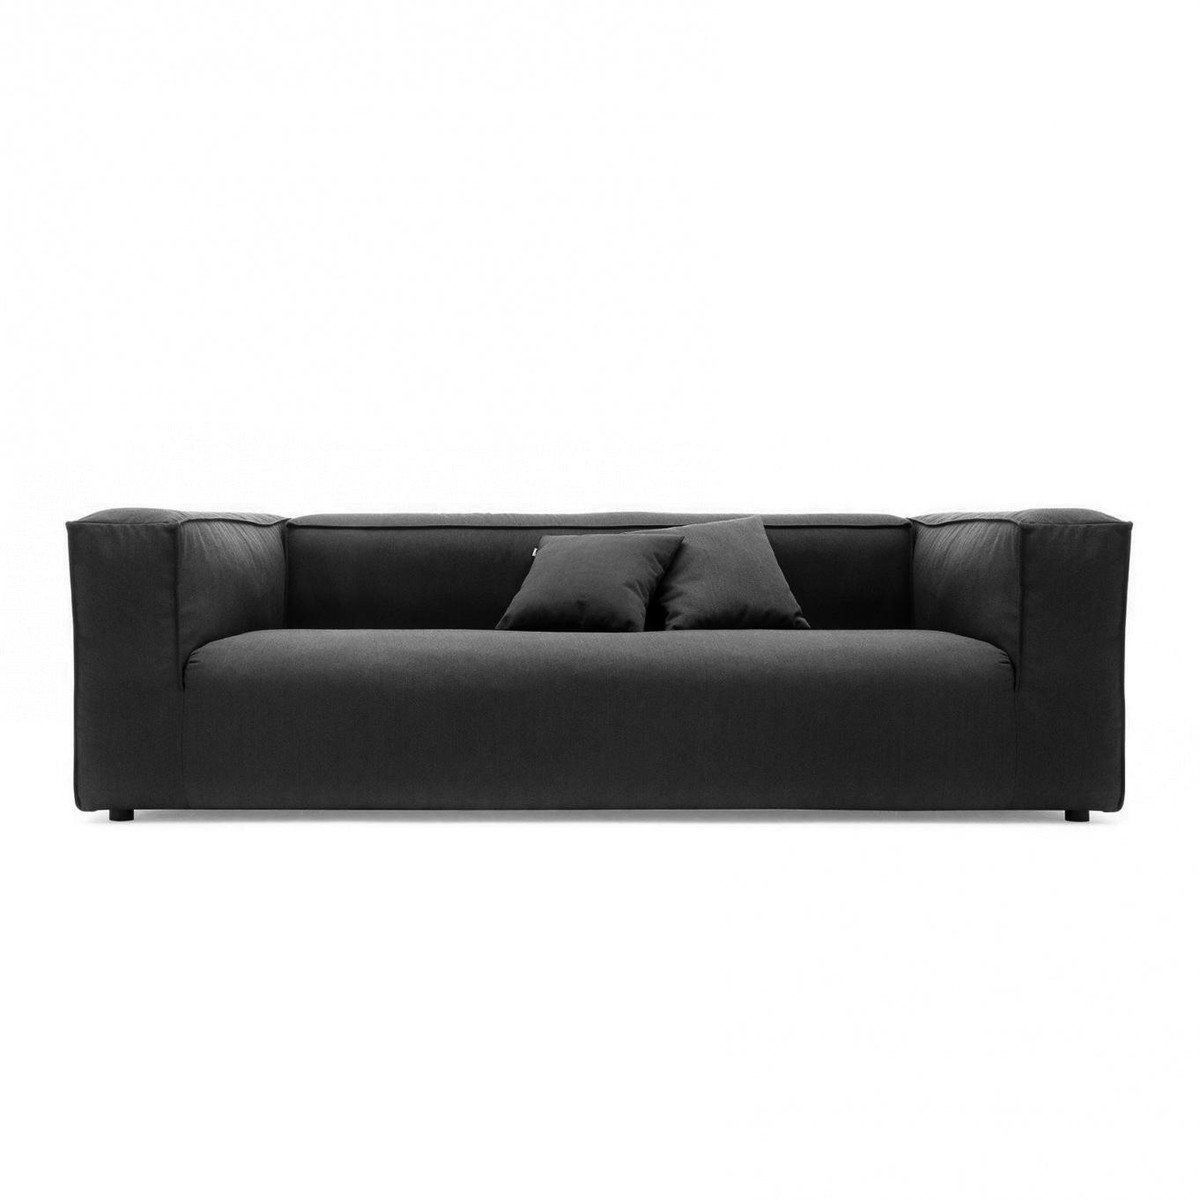 freistil 175 3 Sitzer Sofa